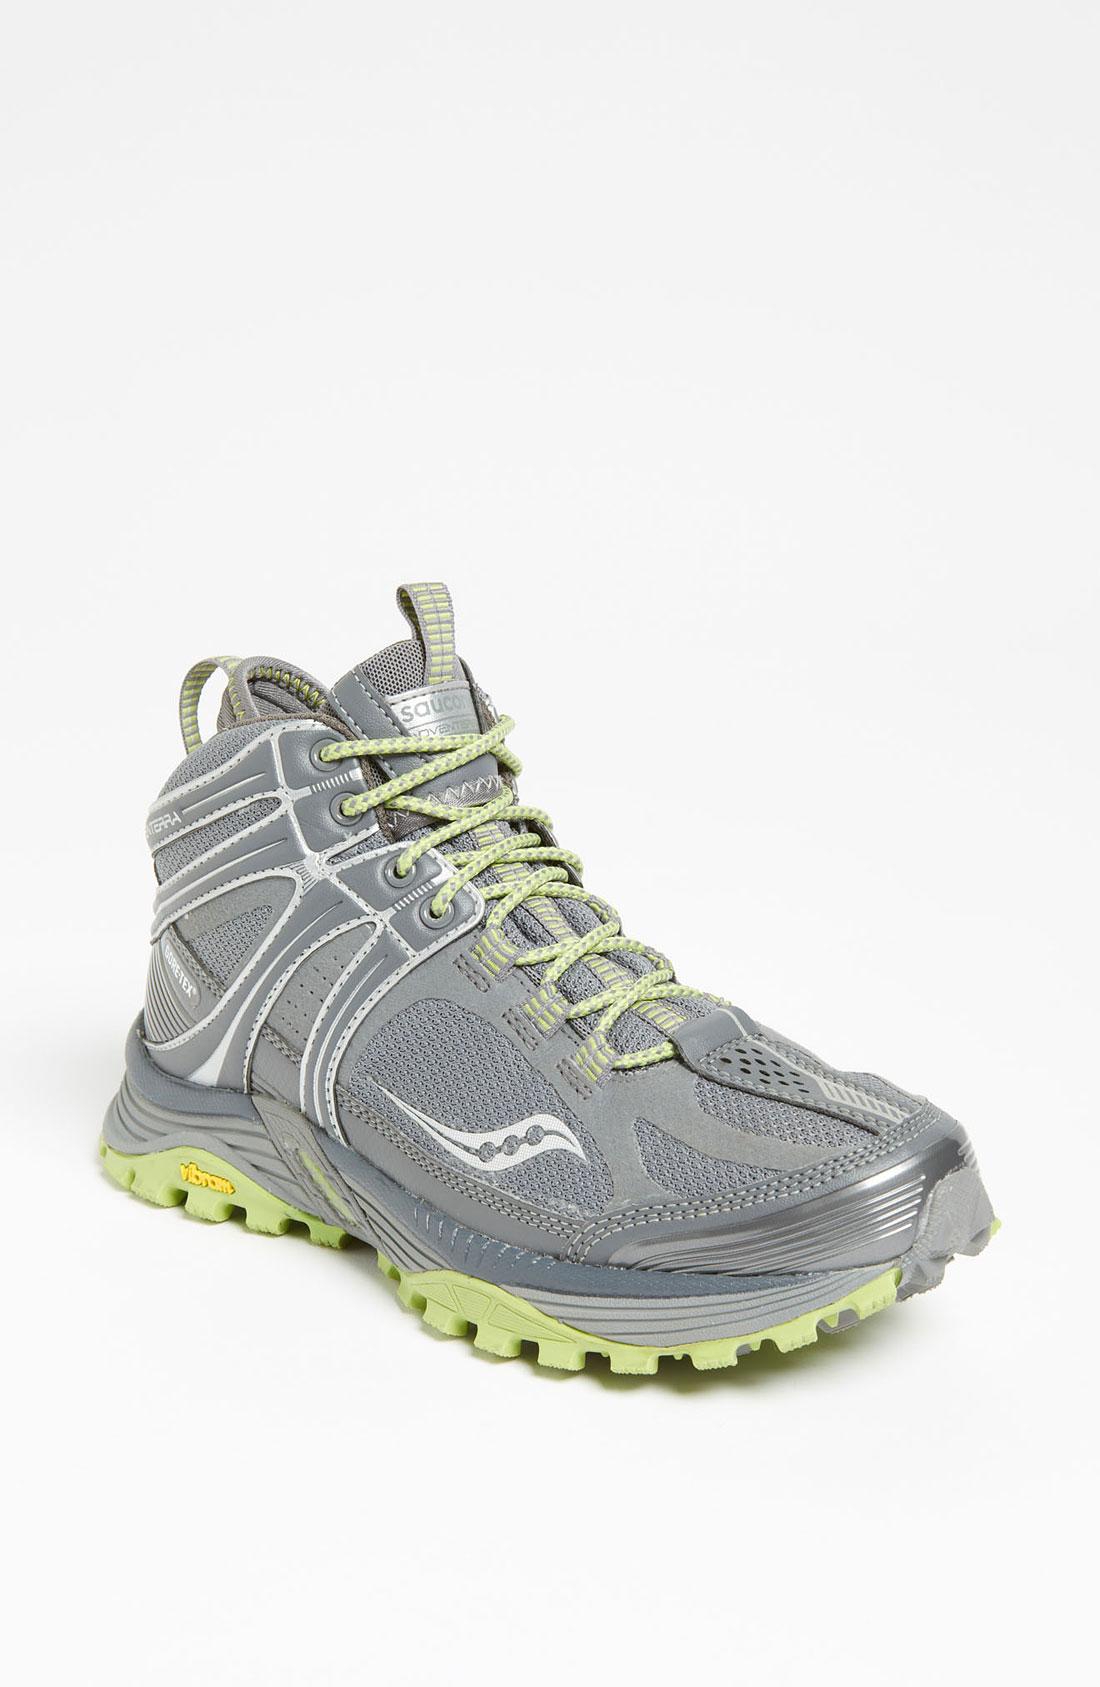 Saucony Progrid Adventerra Gtx Running Shoe Women in Gray (grey/ green